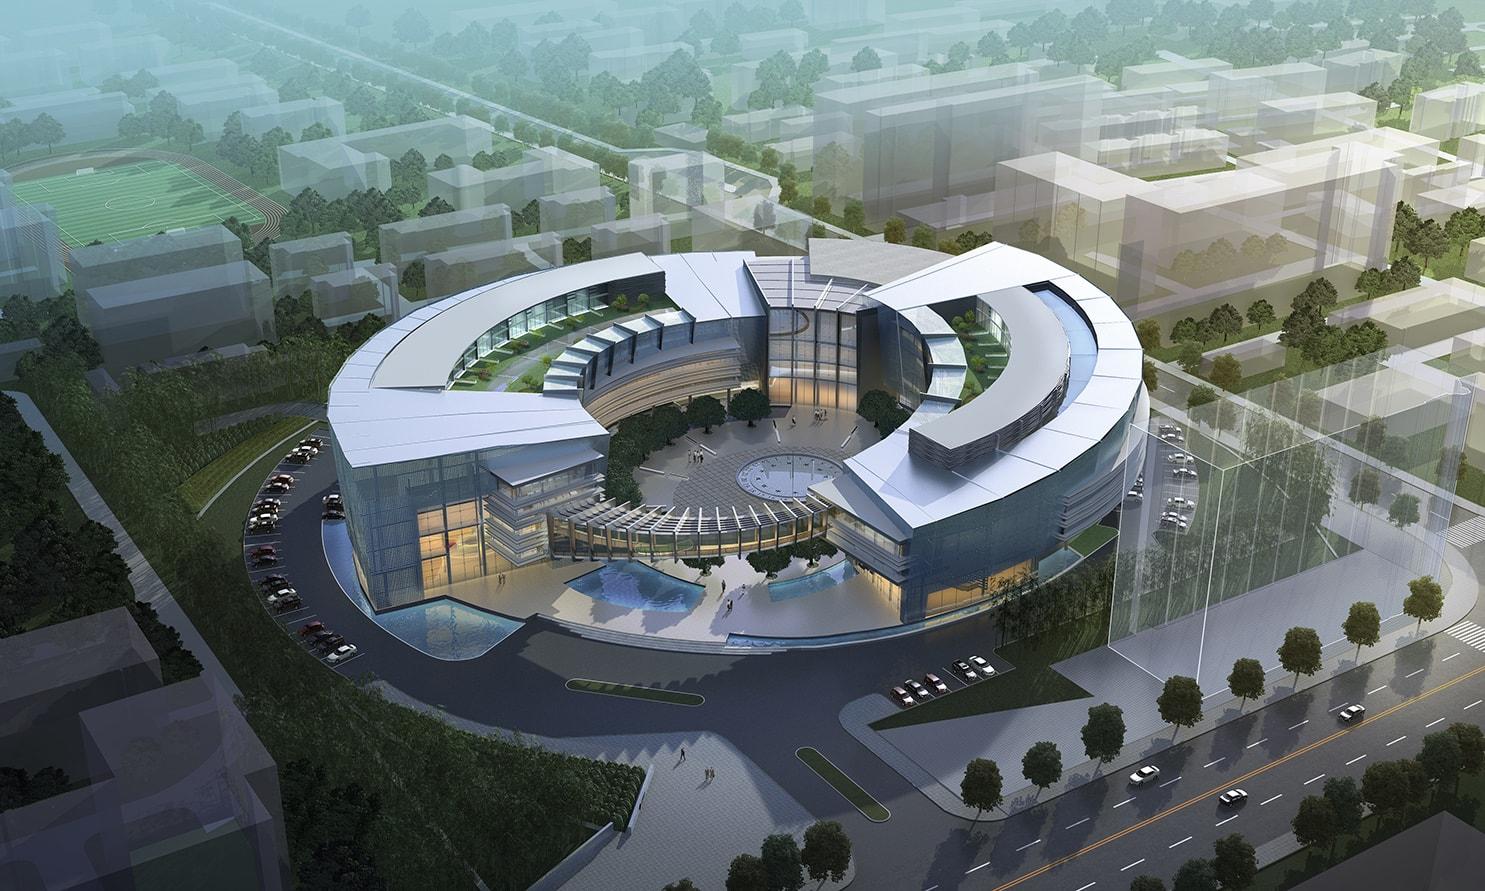 Shanghai Electric by Quezada Architecture (Fred Quezada, Cecilia Quezada, Ed Tingley)